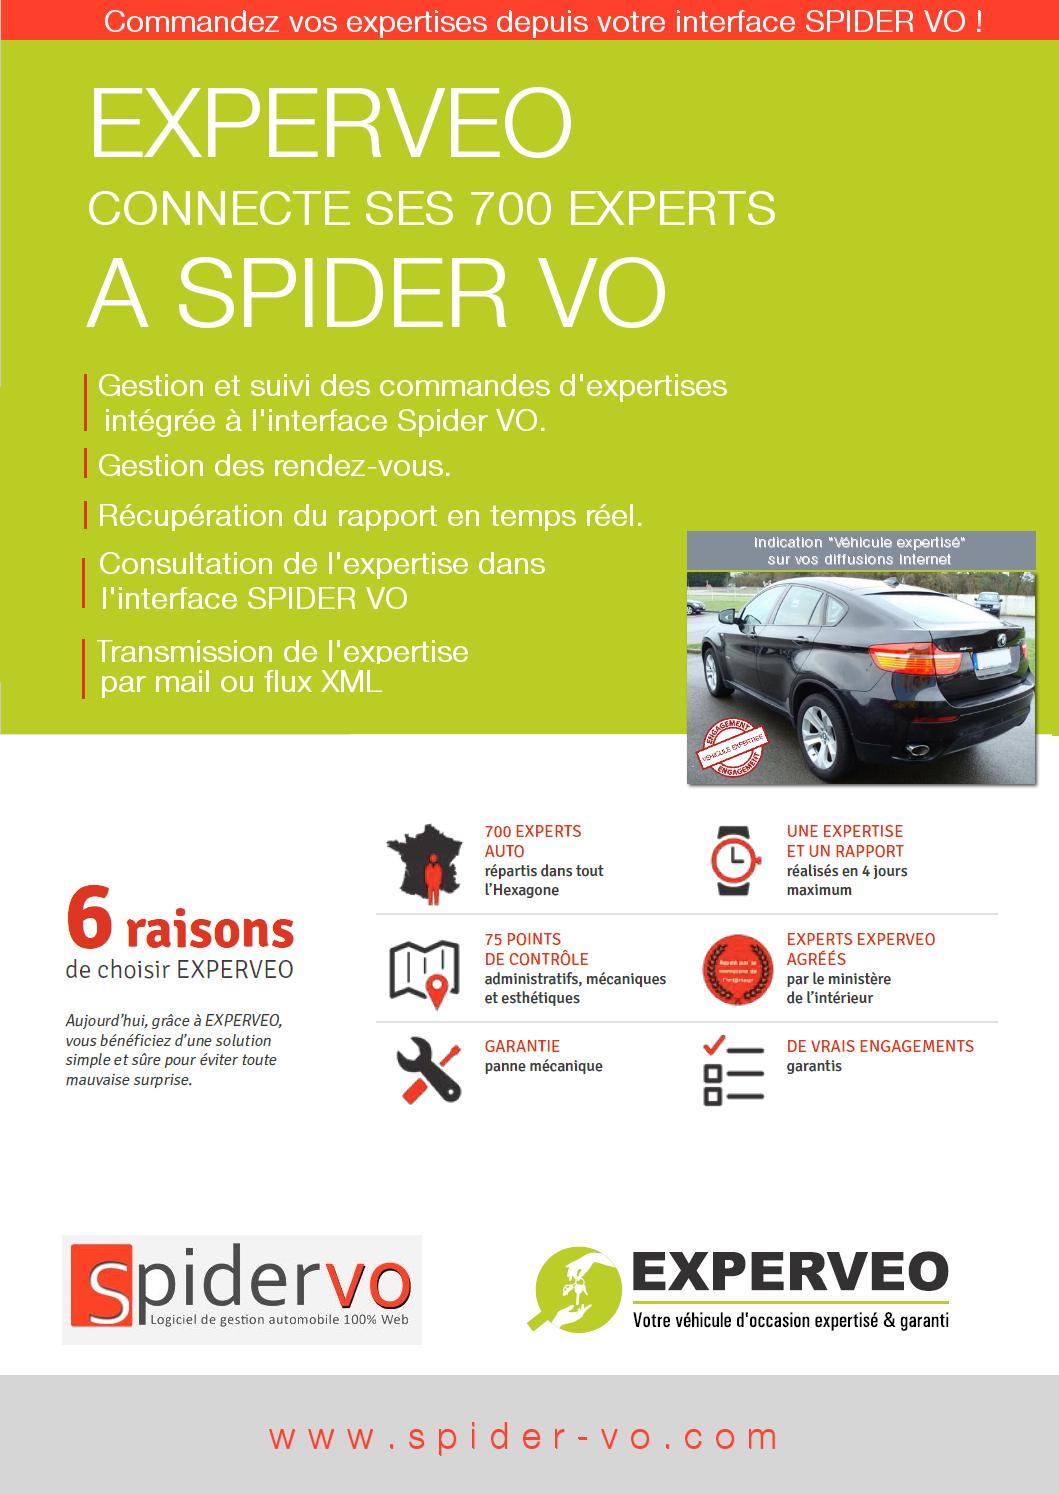 EXPERVEO connecte ses 700 experts à SPIDER VO !